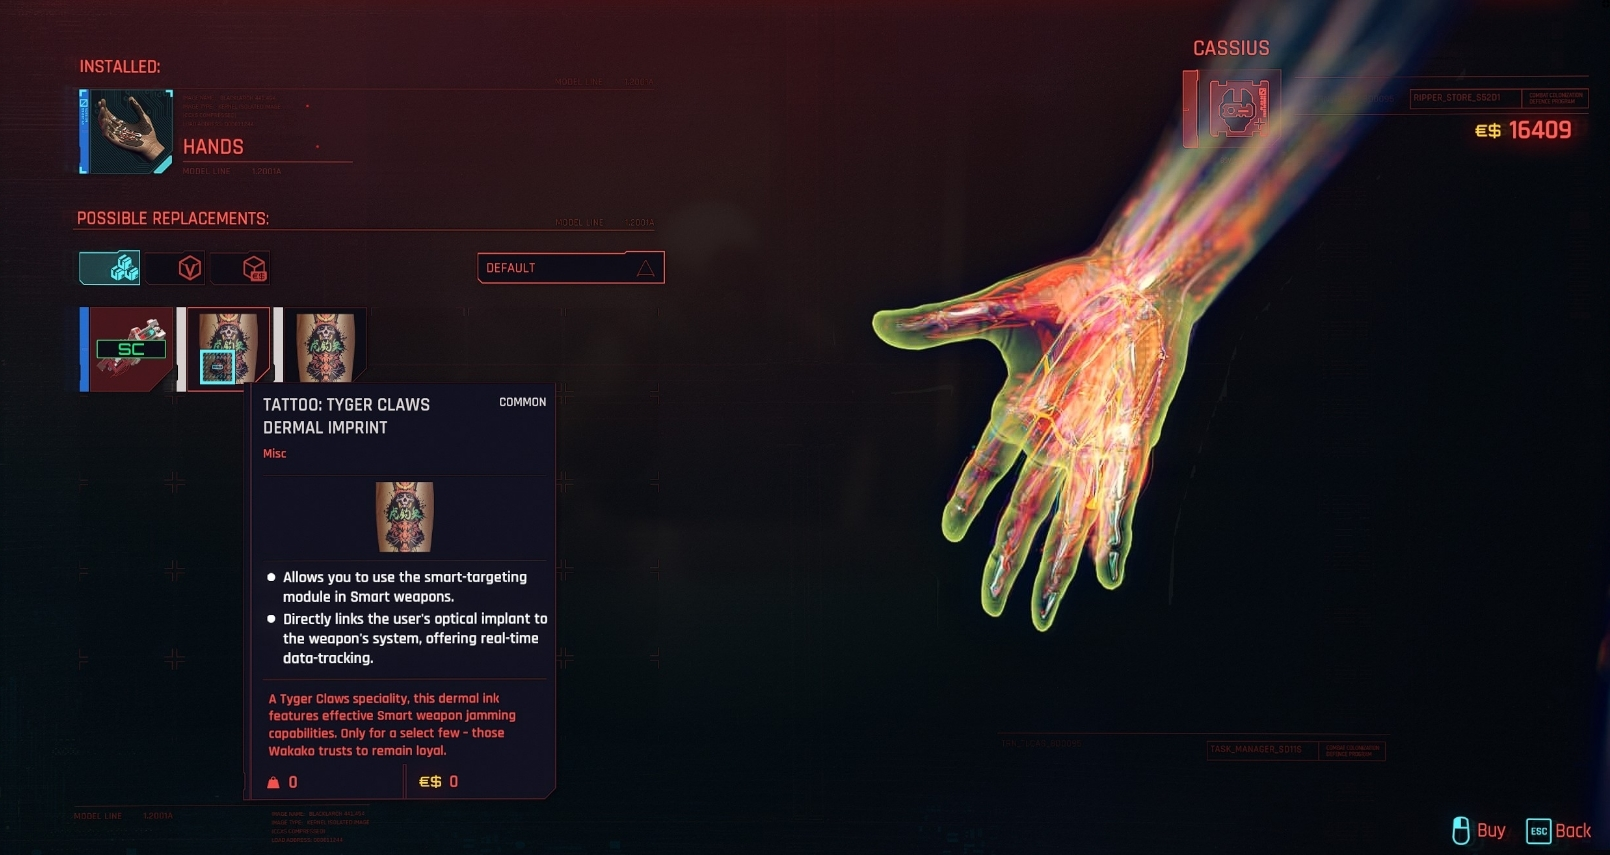 cyberpunk 2077 cassius ryder free reward